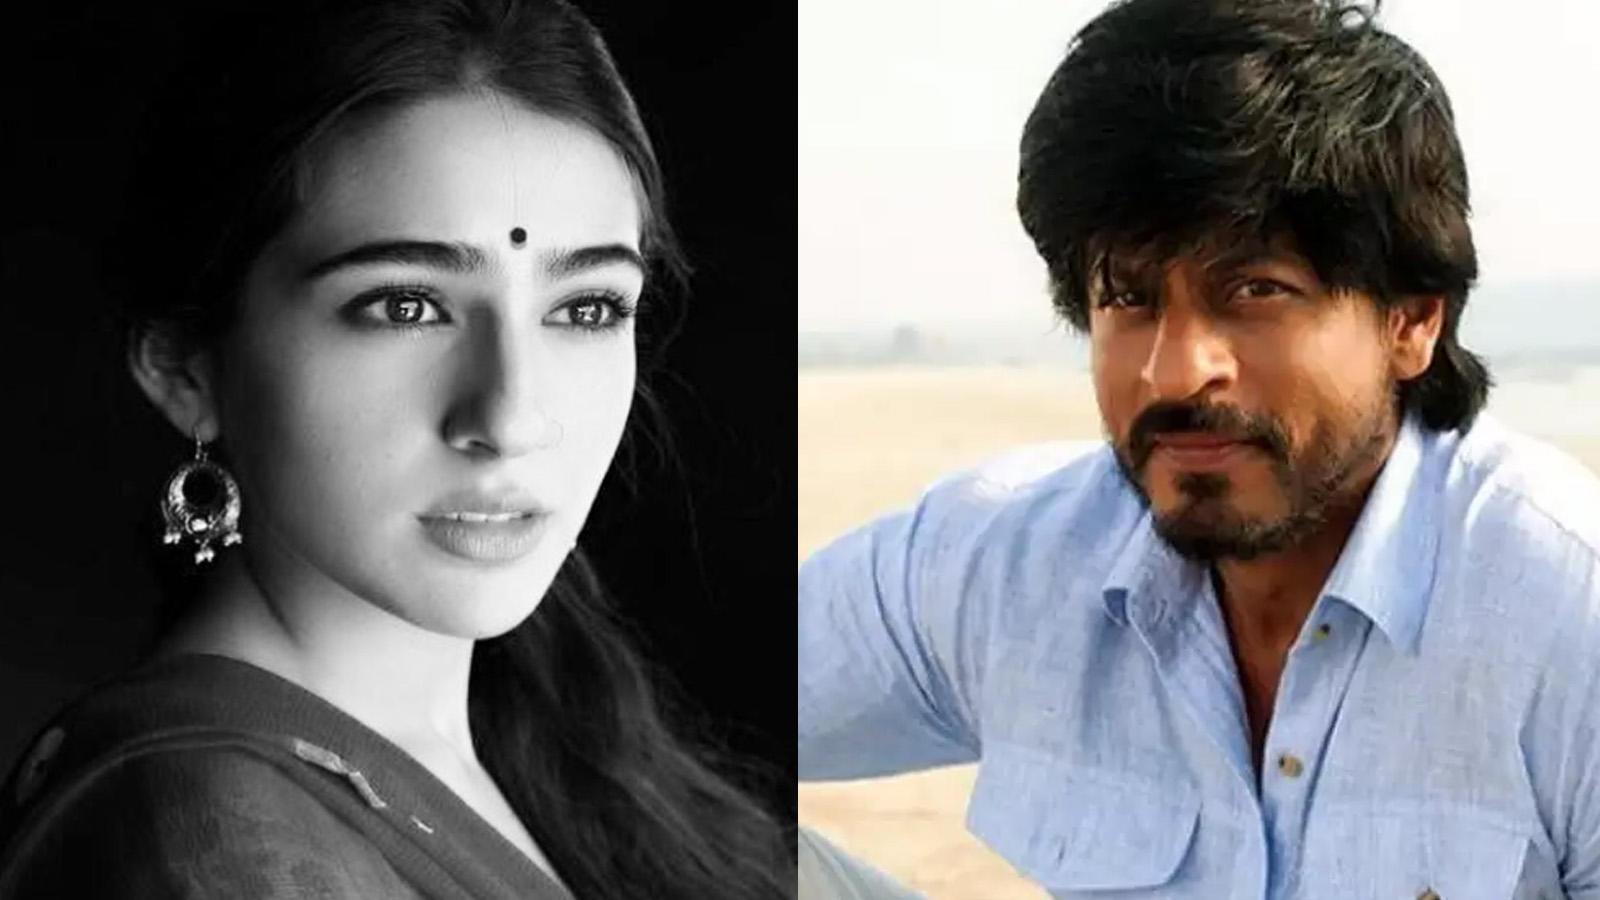 Sara Ali Khan addresses Shah Rukh Khan as 'uncle', SRK fans irked